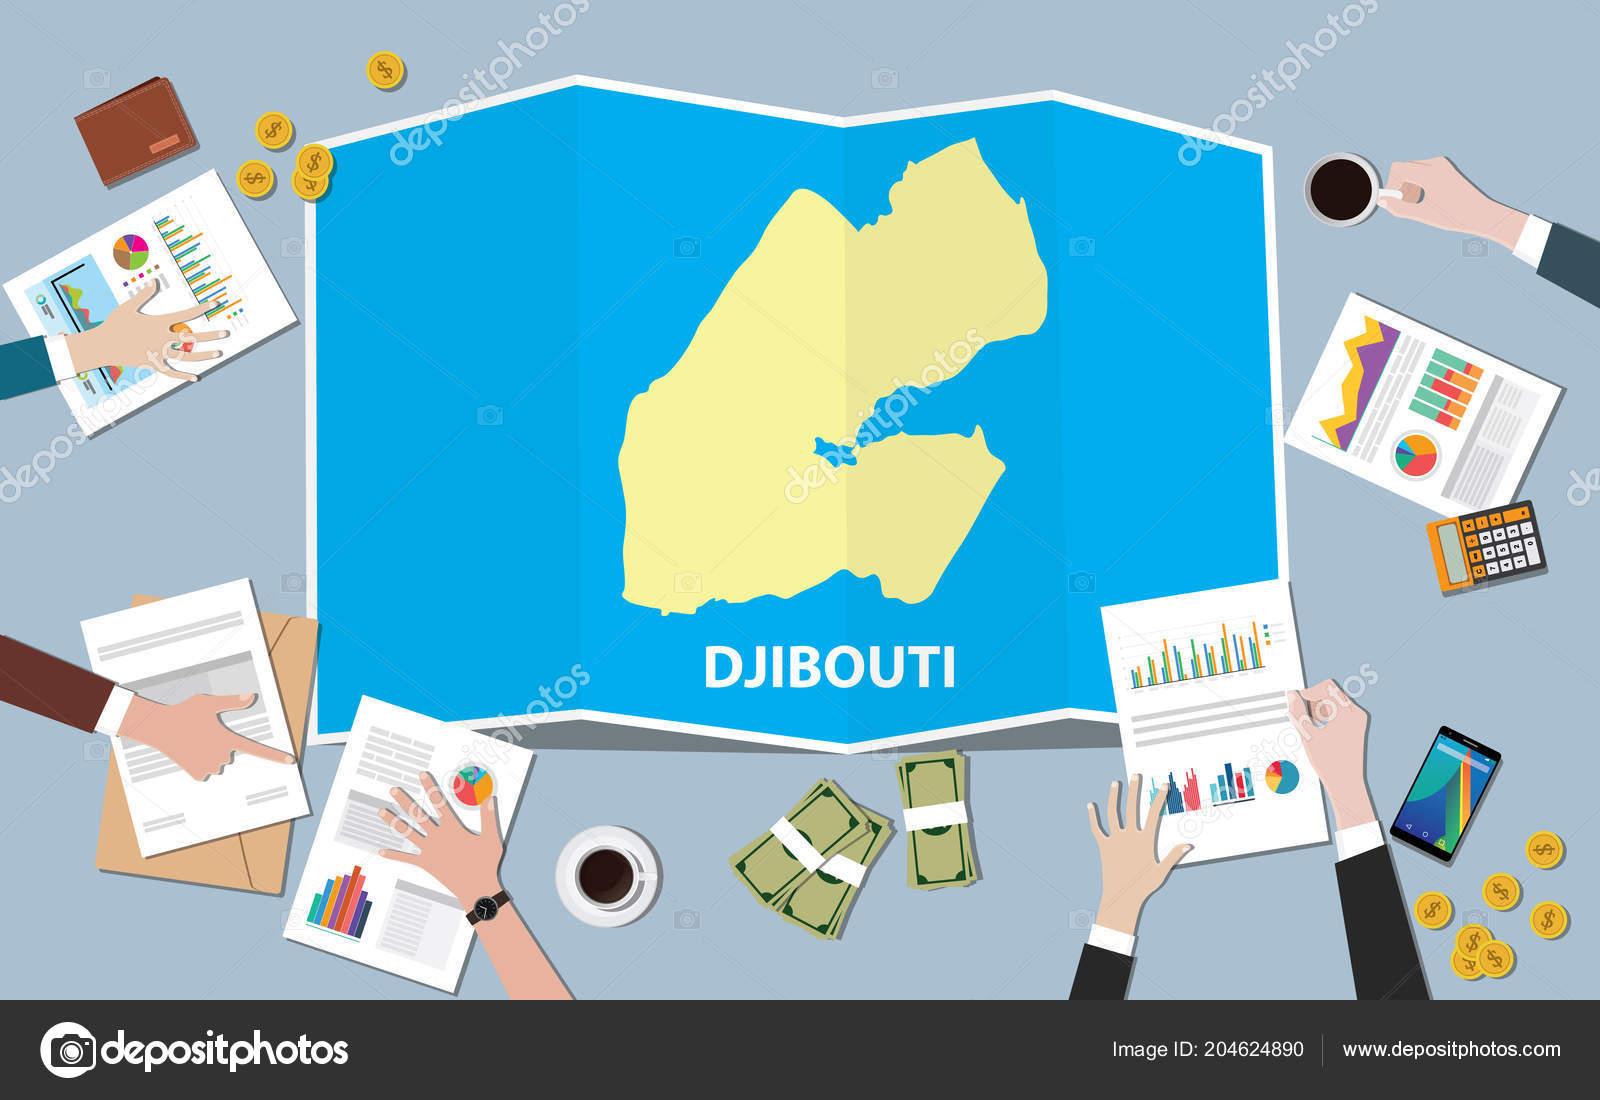 on djibouti africa map